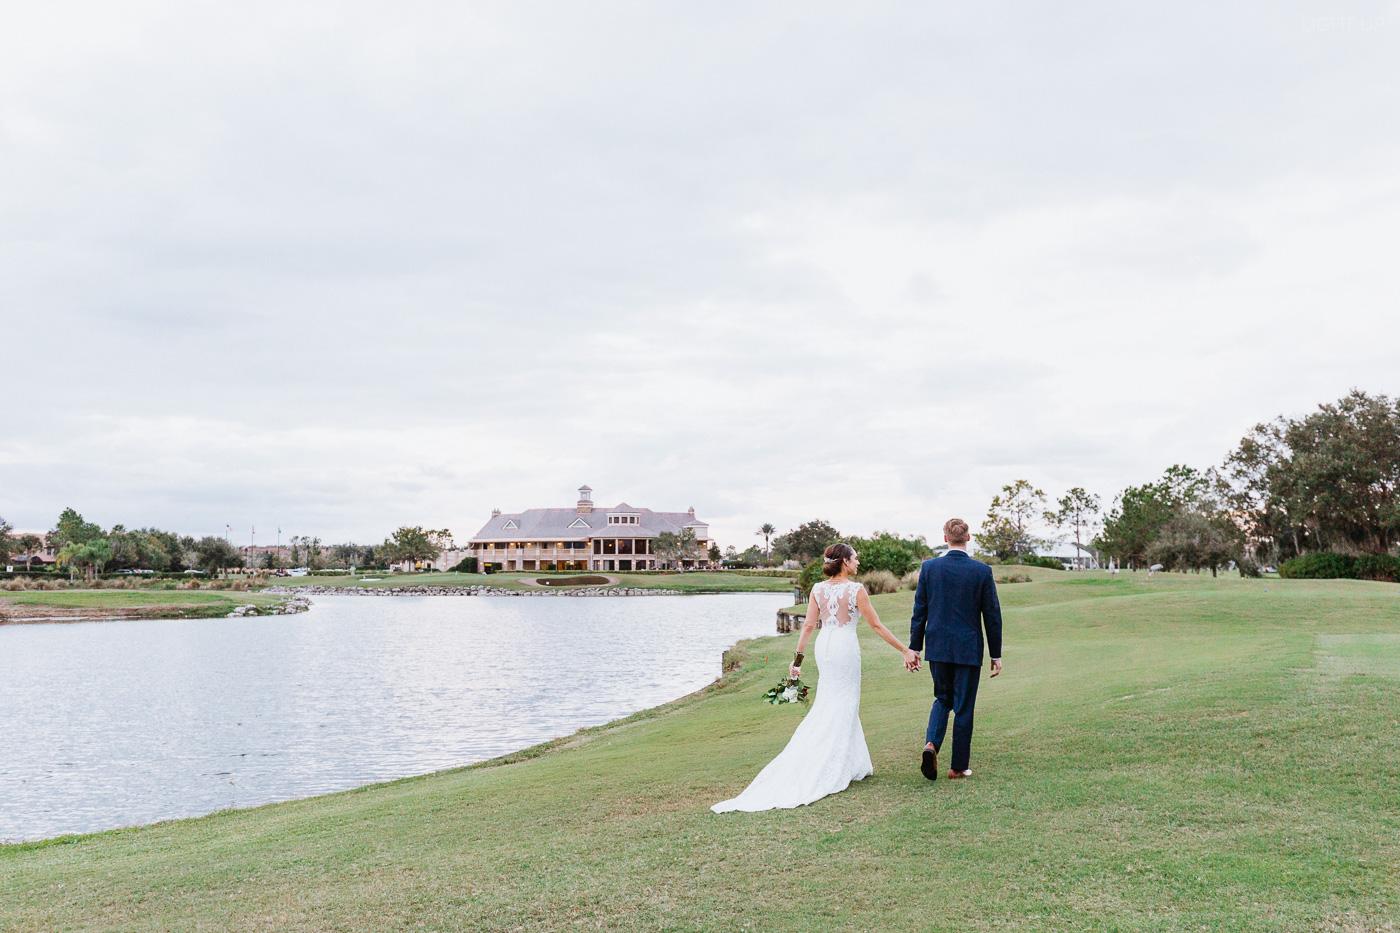 wedding at eagle creek orlando-10.jpg